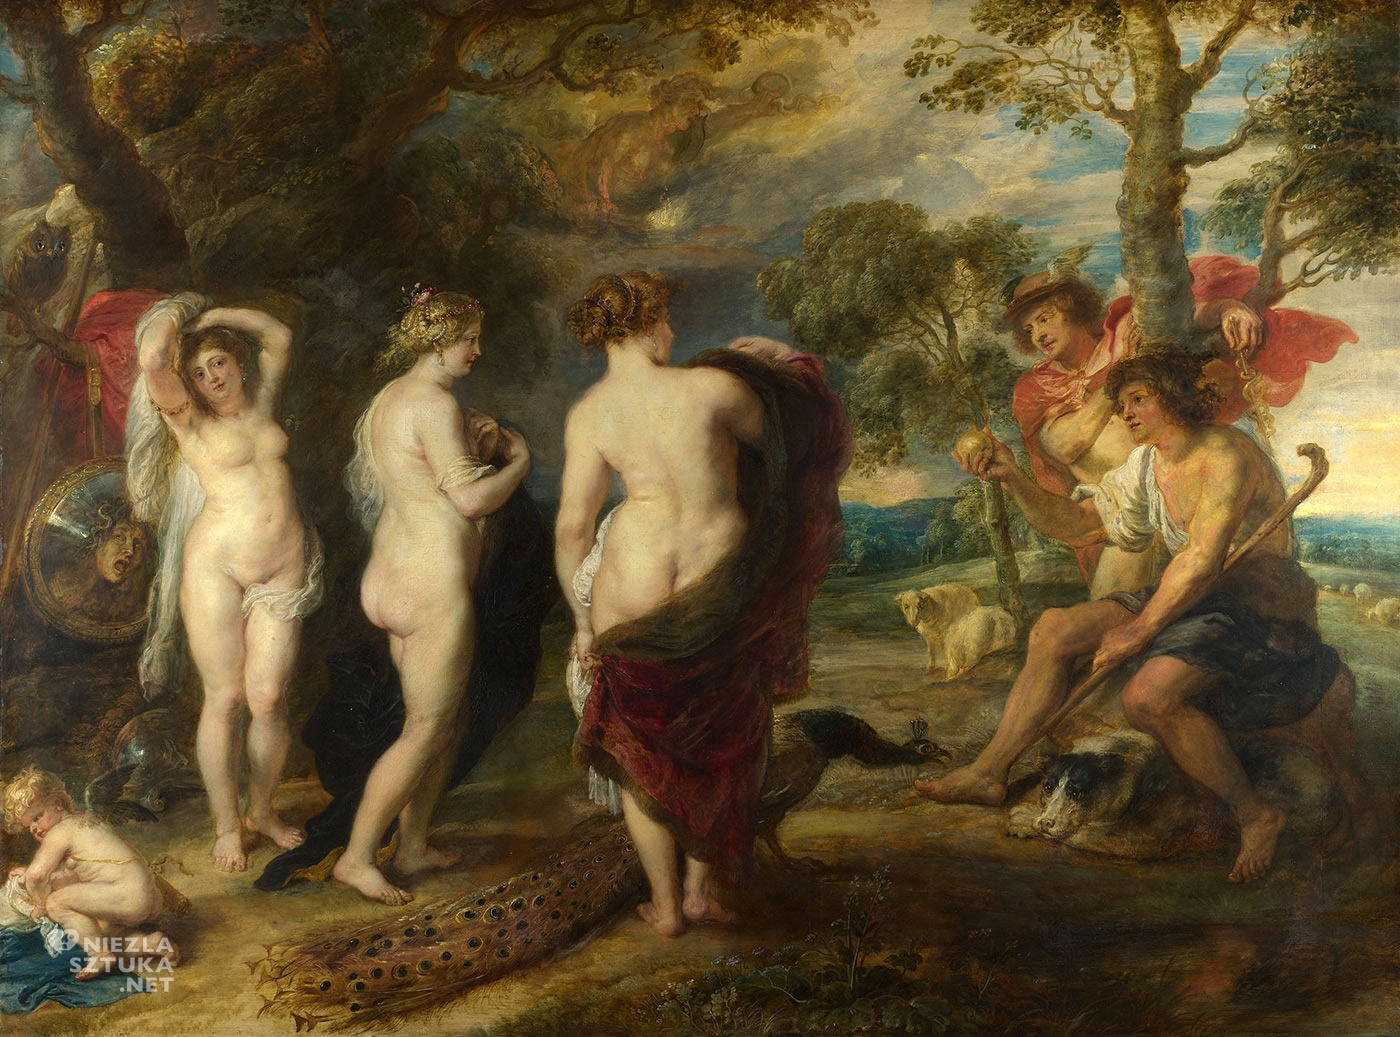 Peter Paul Rubens, Sąd Parysa, malarstwo flamandzkie, mitologia, Niezła Sztuka